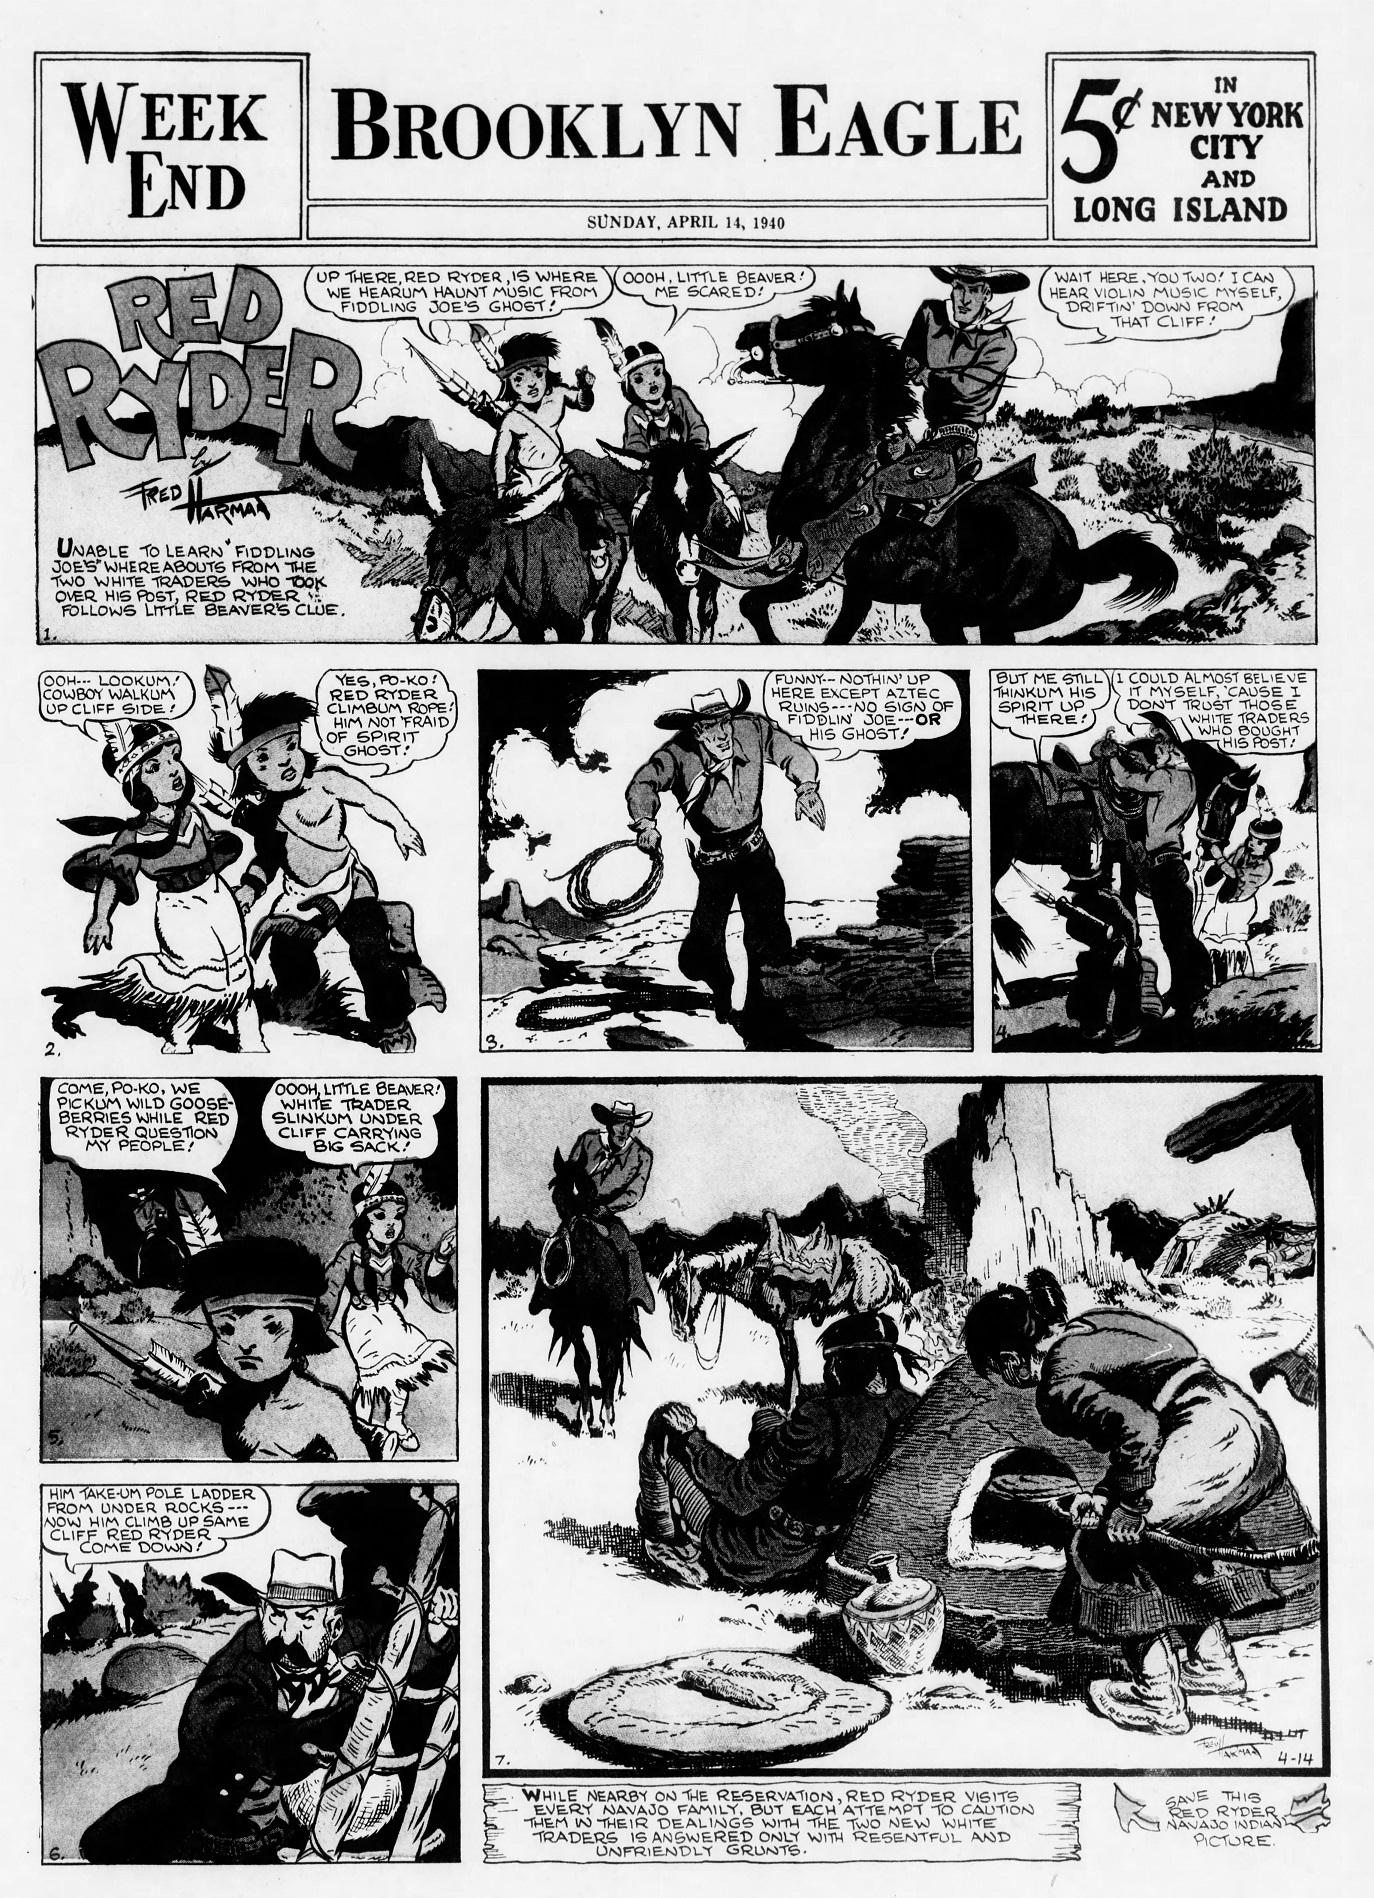 The_Brooklyn_Daily_Eagle_Sun__Apr_14__1940_(5).jpg